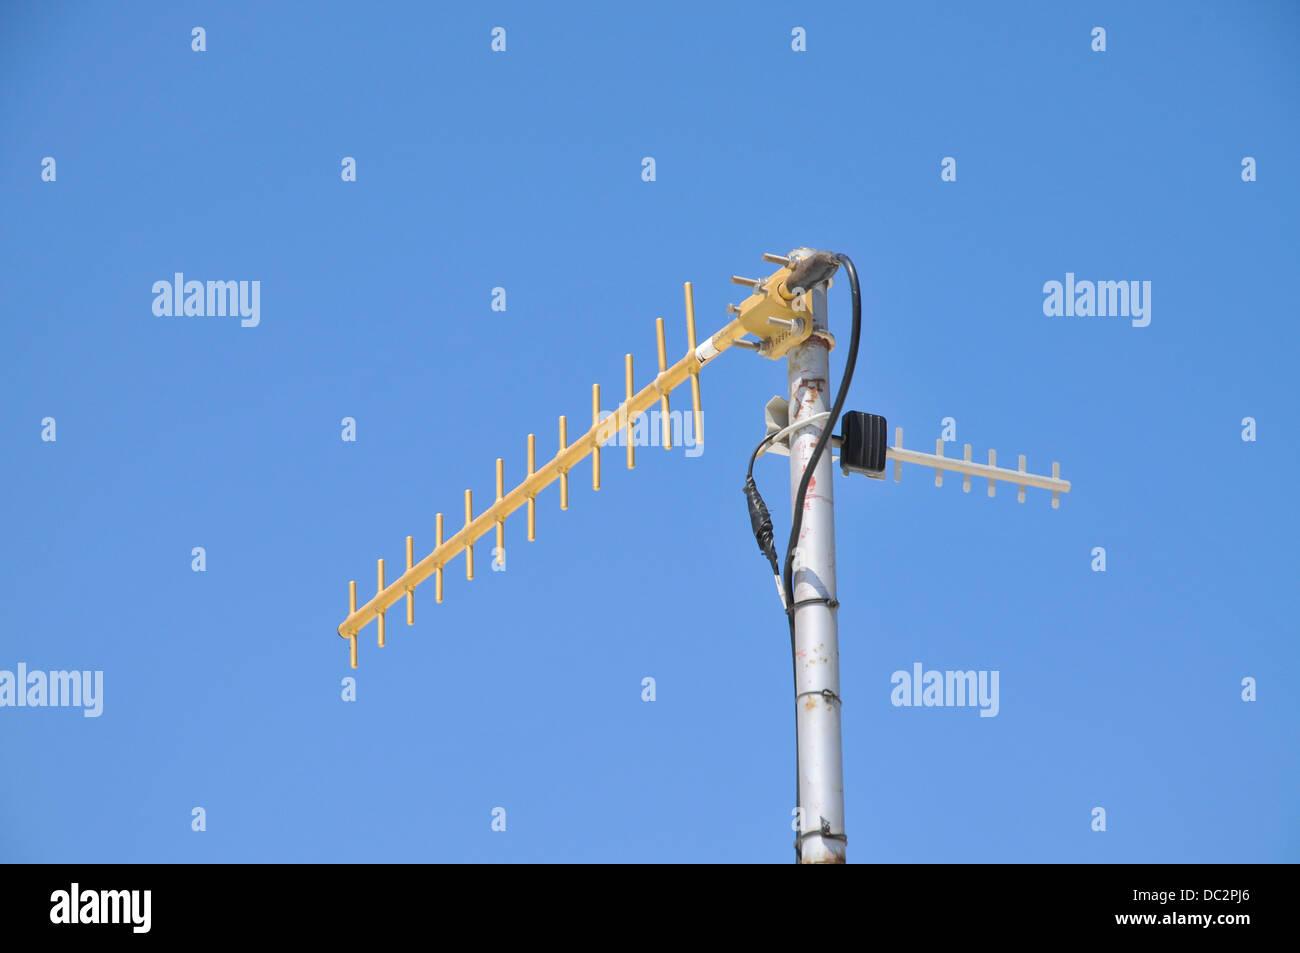 Antena RF sobre fondo de cielo azul Foto de stock